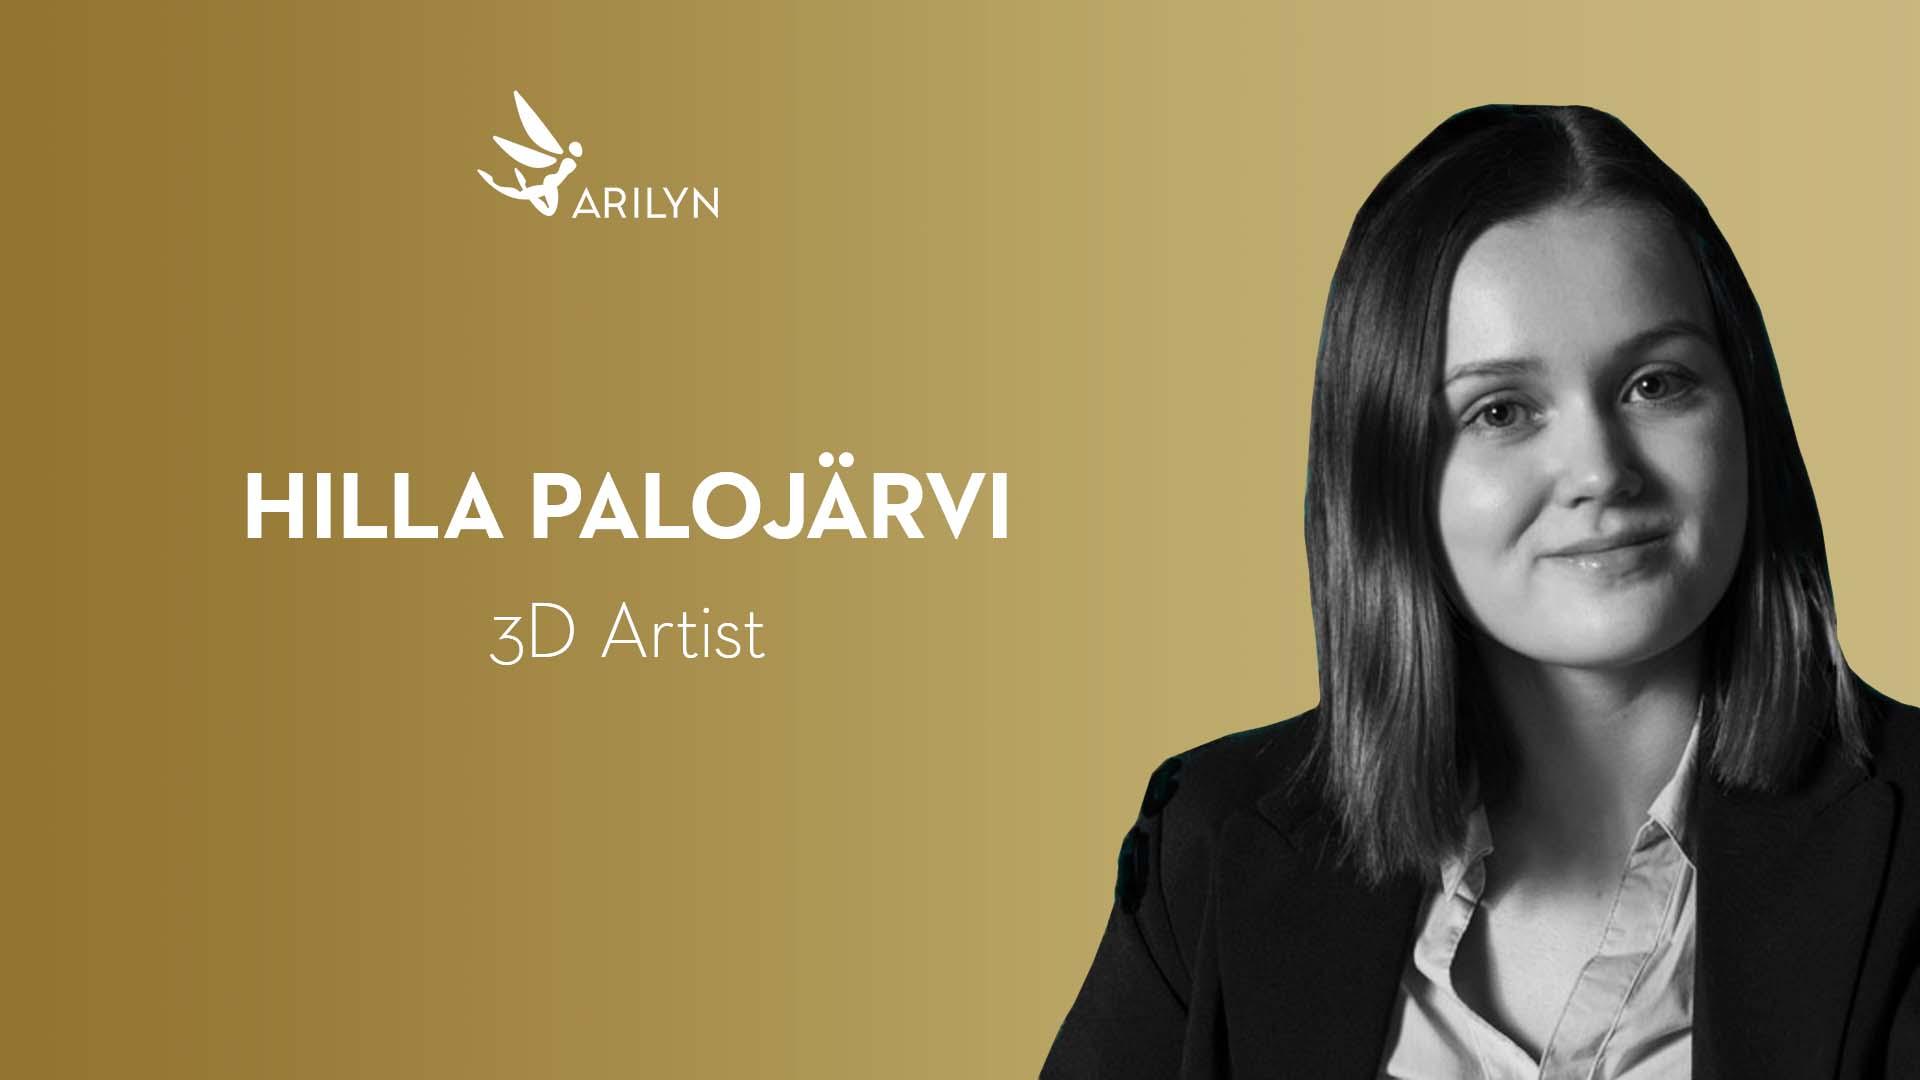 Get to know Arilyn – Hilla Palojärvi, 3D Artist